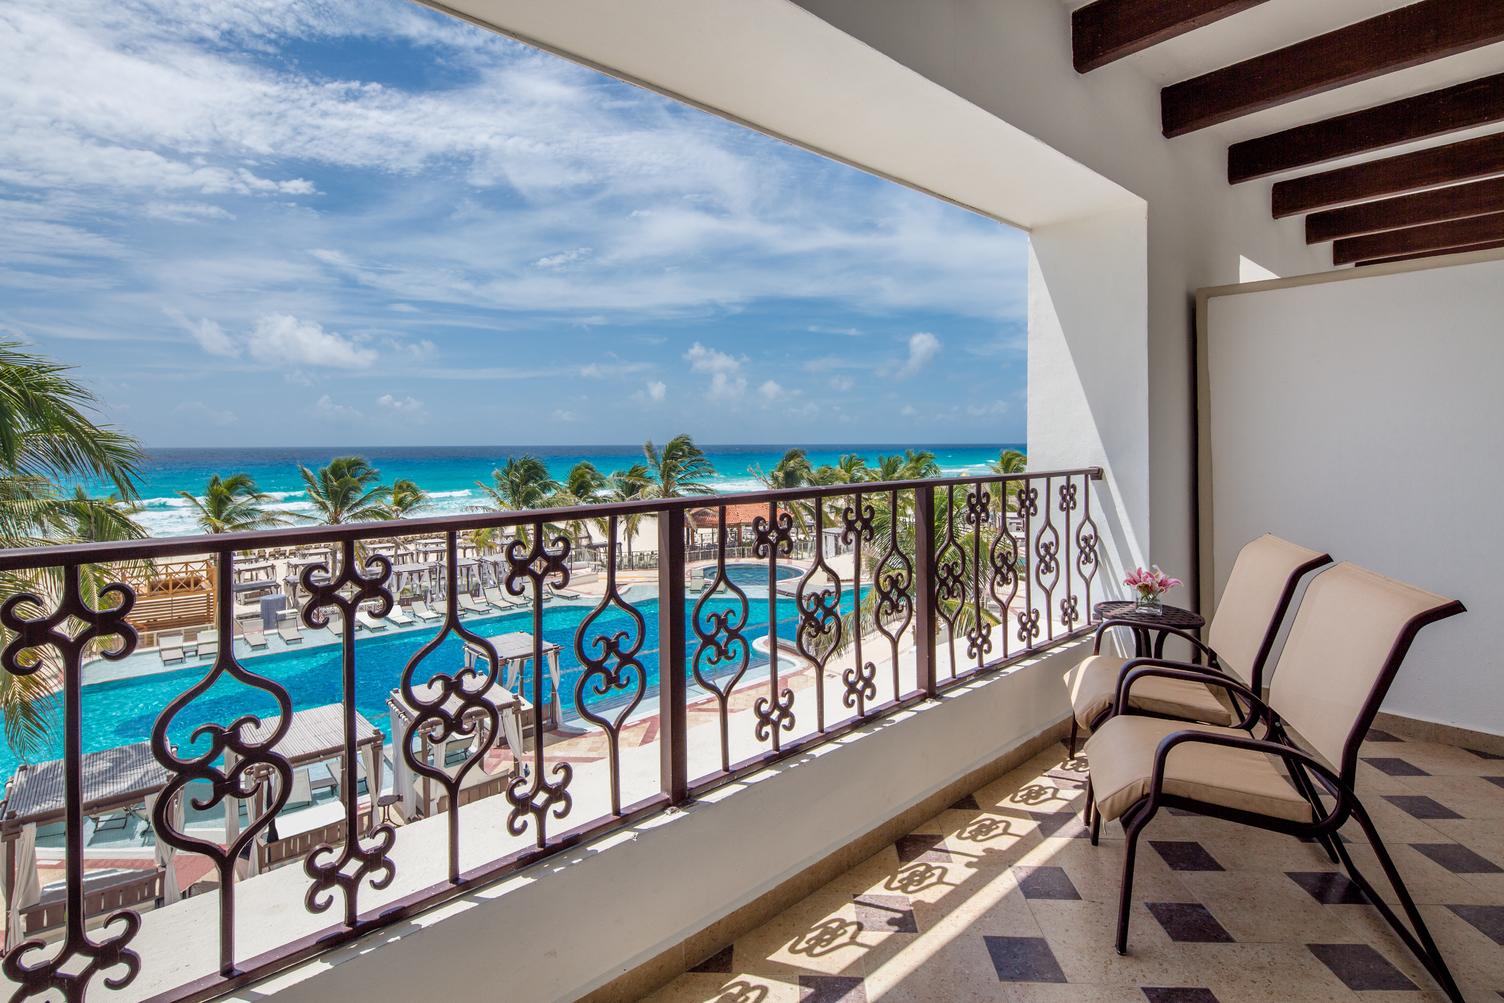 Hyatt-Zilara-Cancun-Junior-Suite-View.jpg